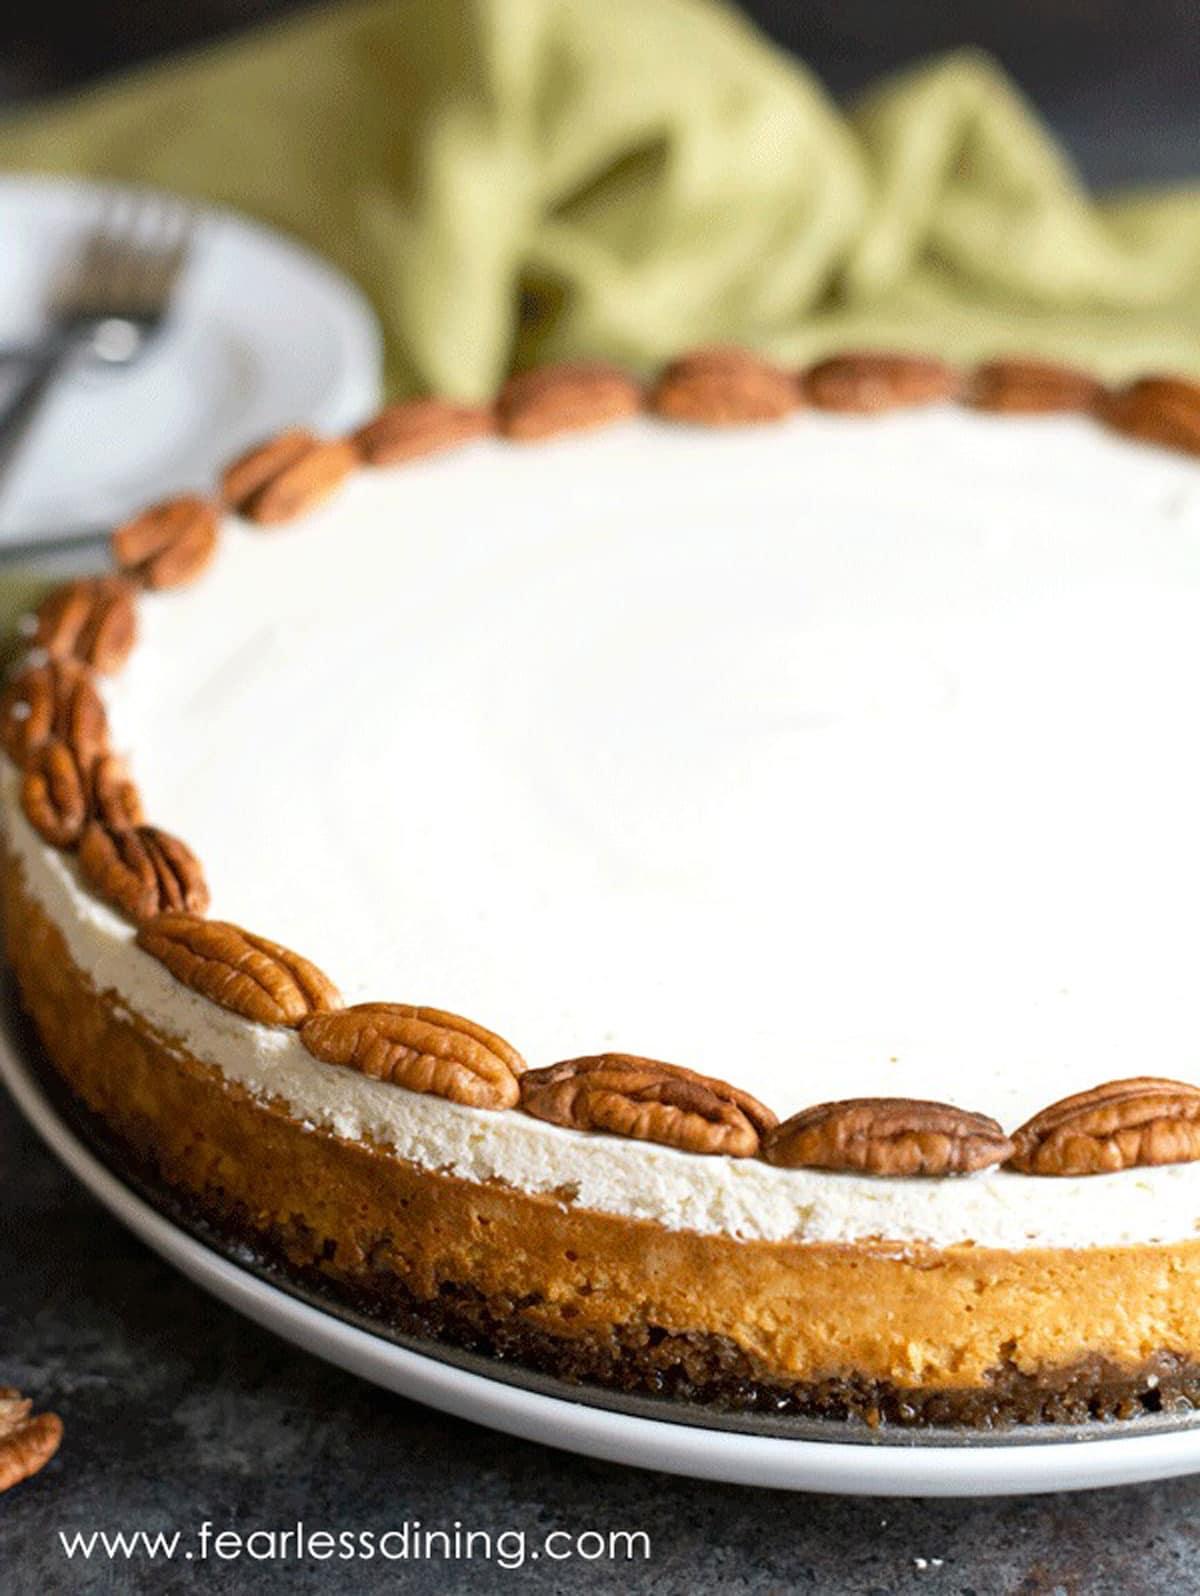 a gluten free pumpkin cheesecake on a table